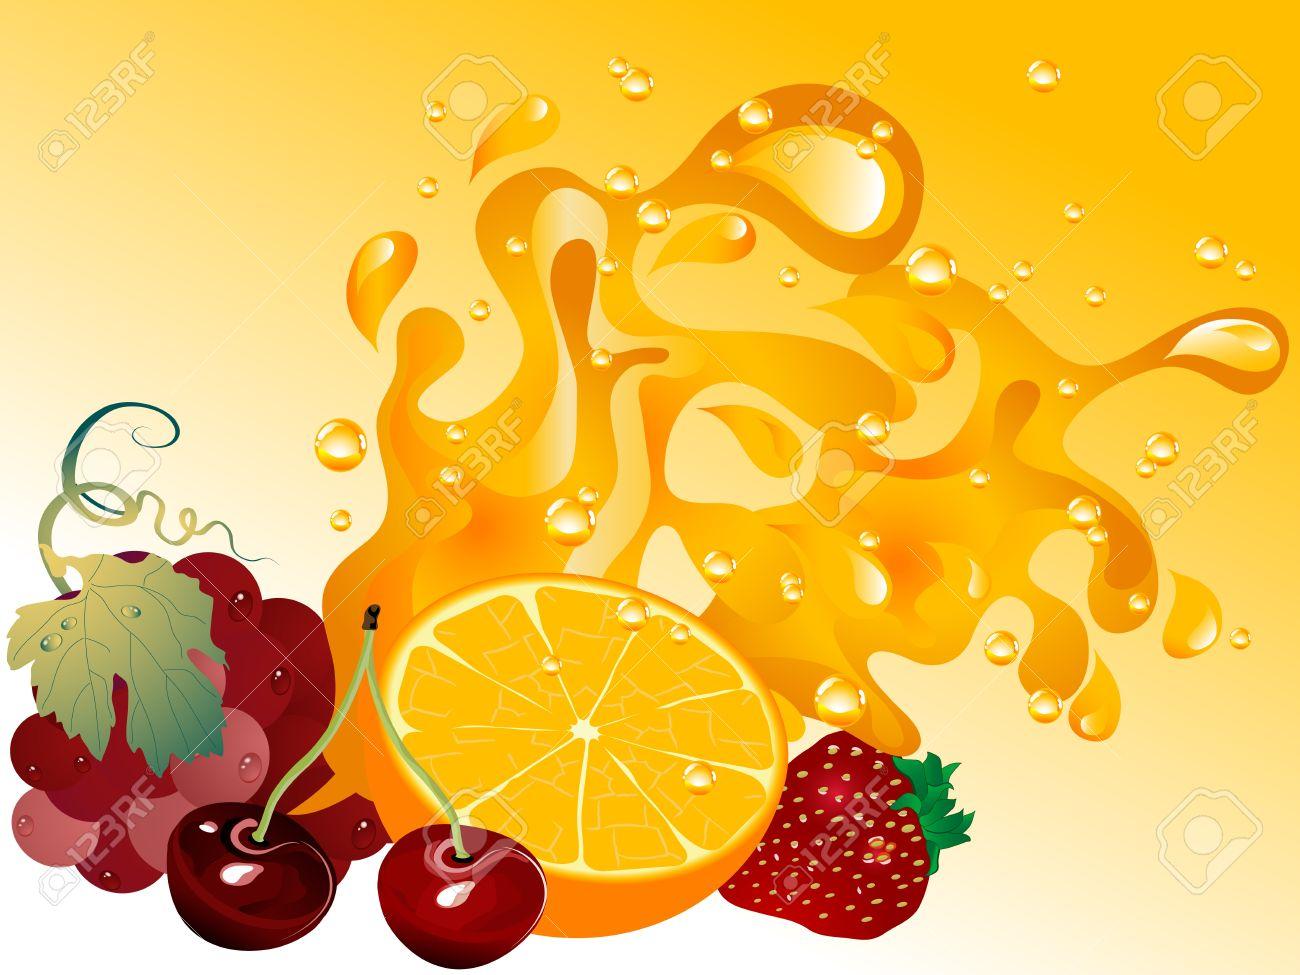 Fruit splash classic - Fruit Juice Splash And The Fruits Stock Vector 11830889